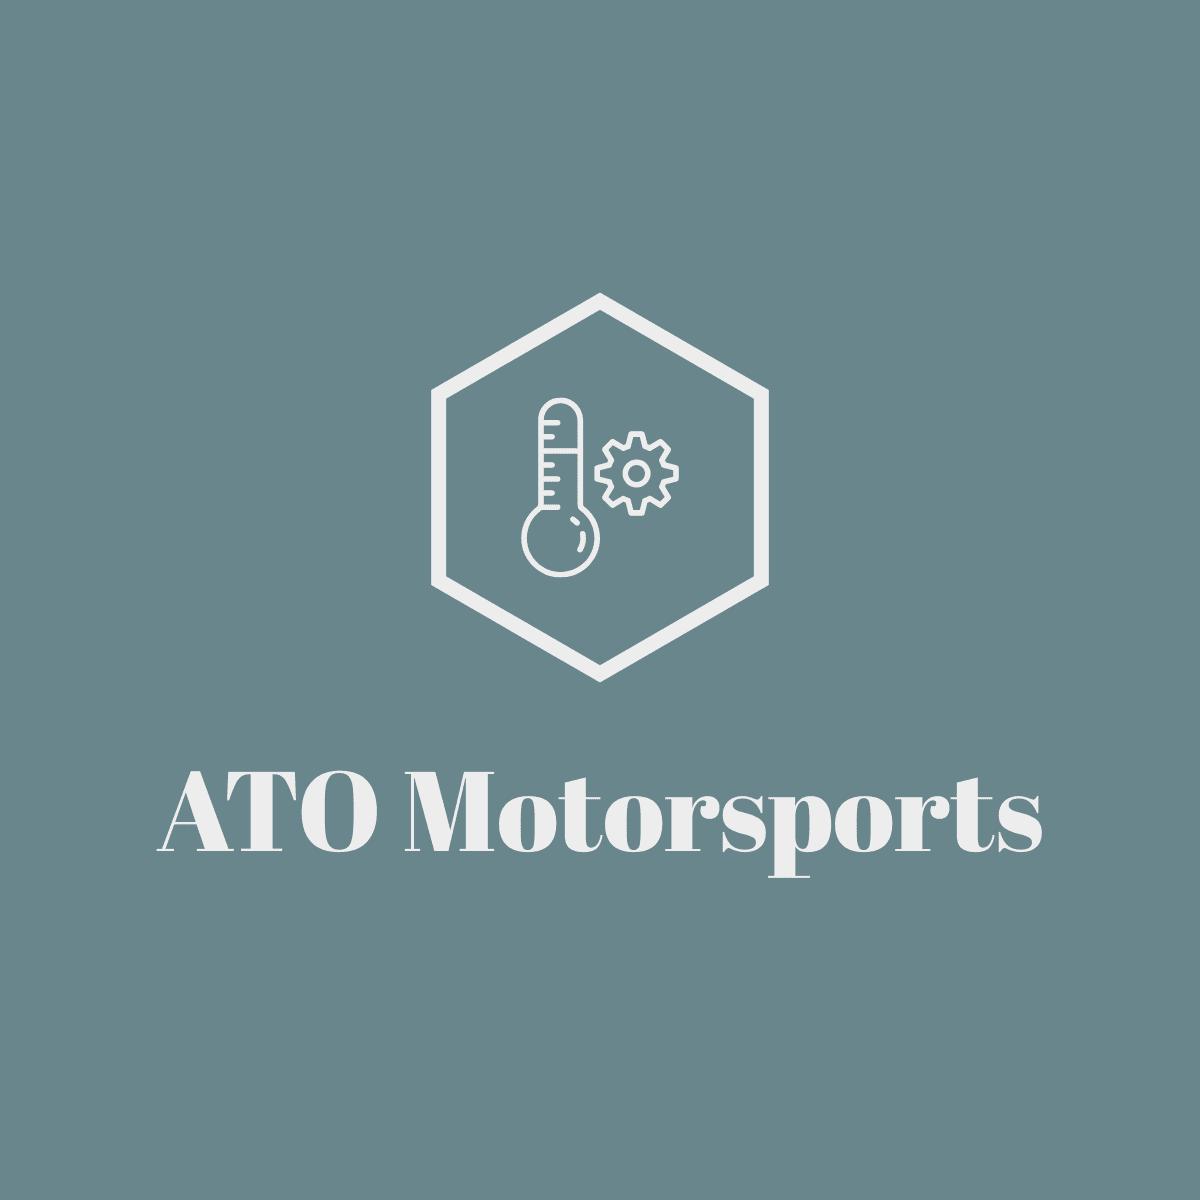 ATO Motorsports